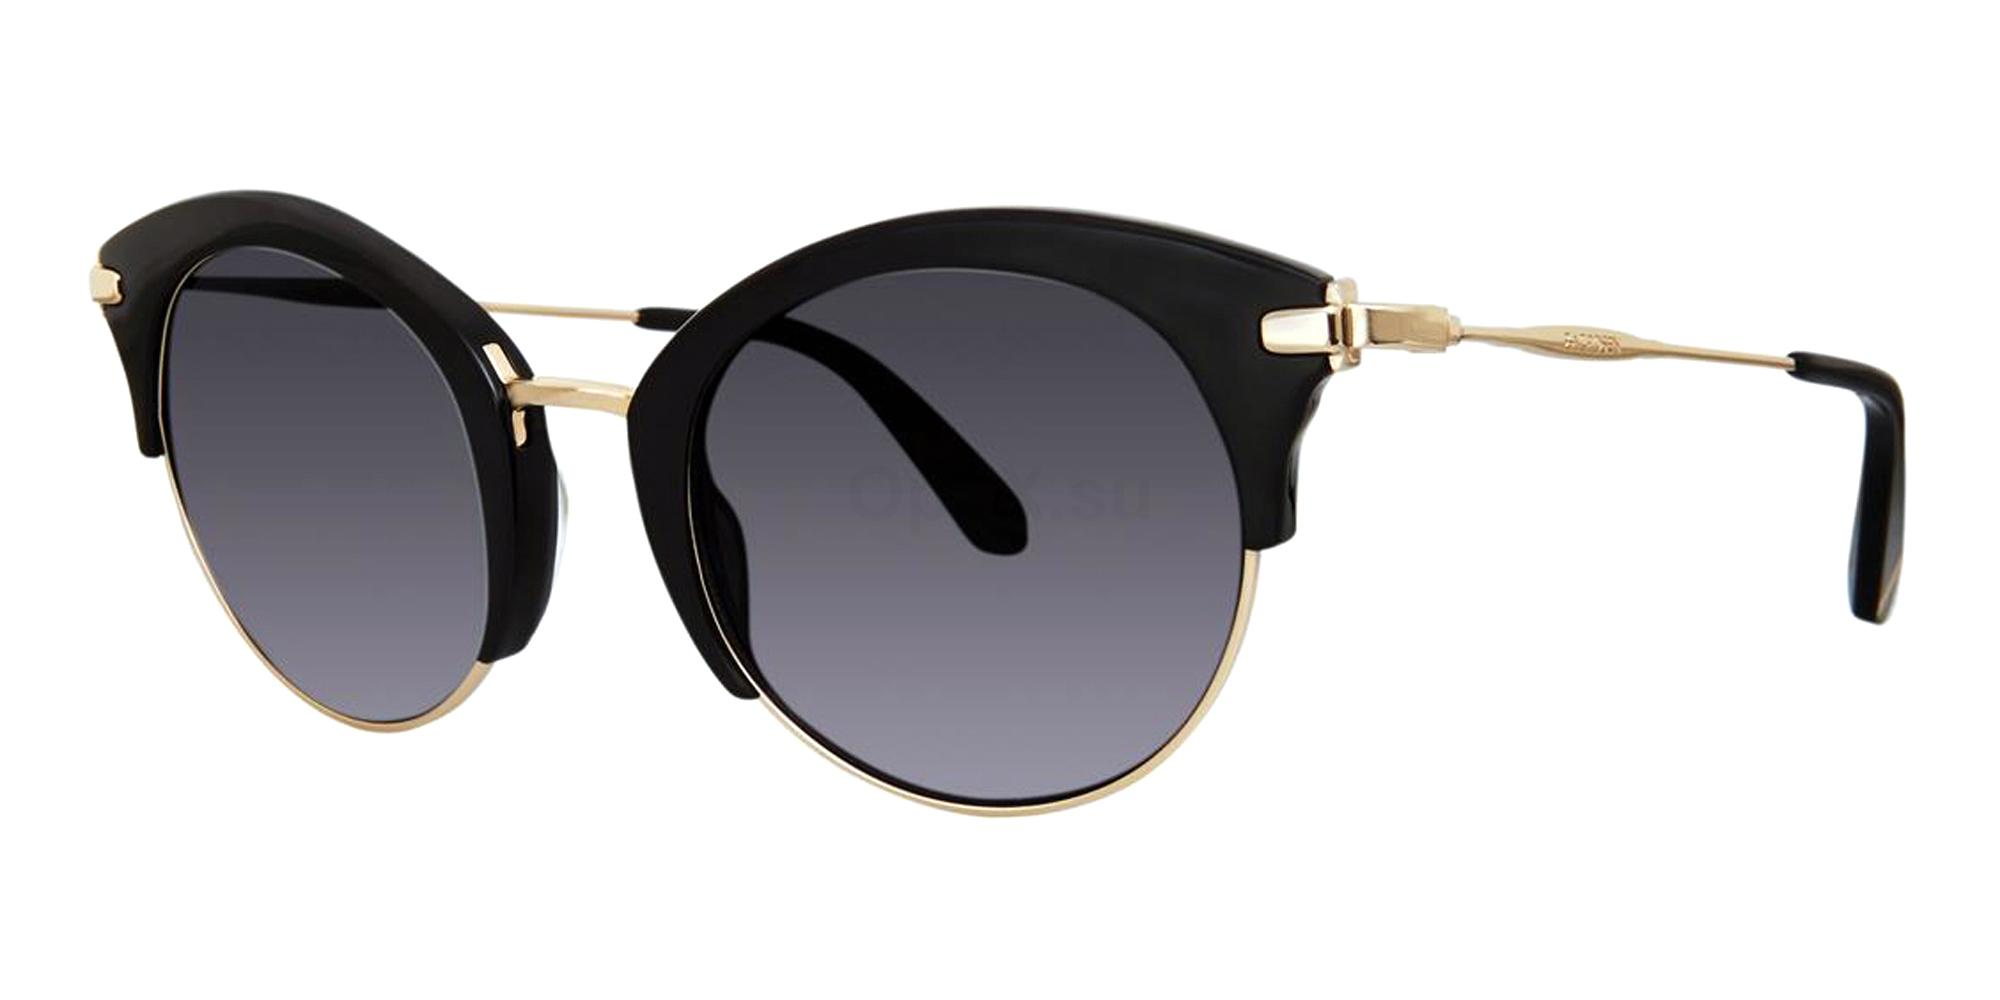 Black ZADIE Sunglasses, Zac Posen